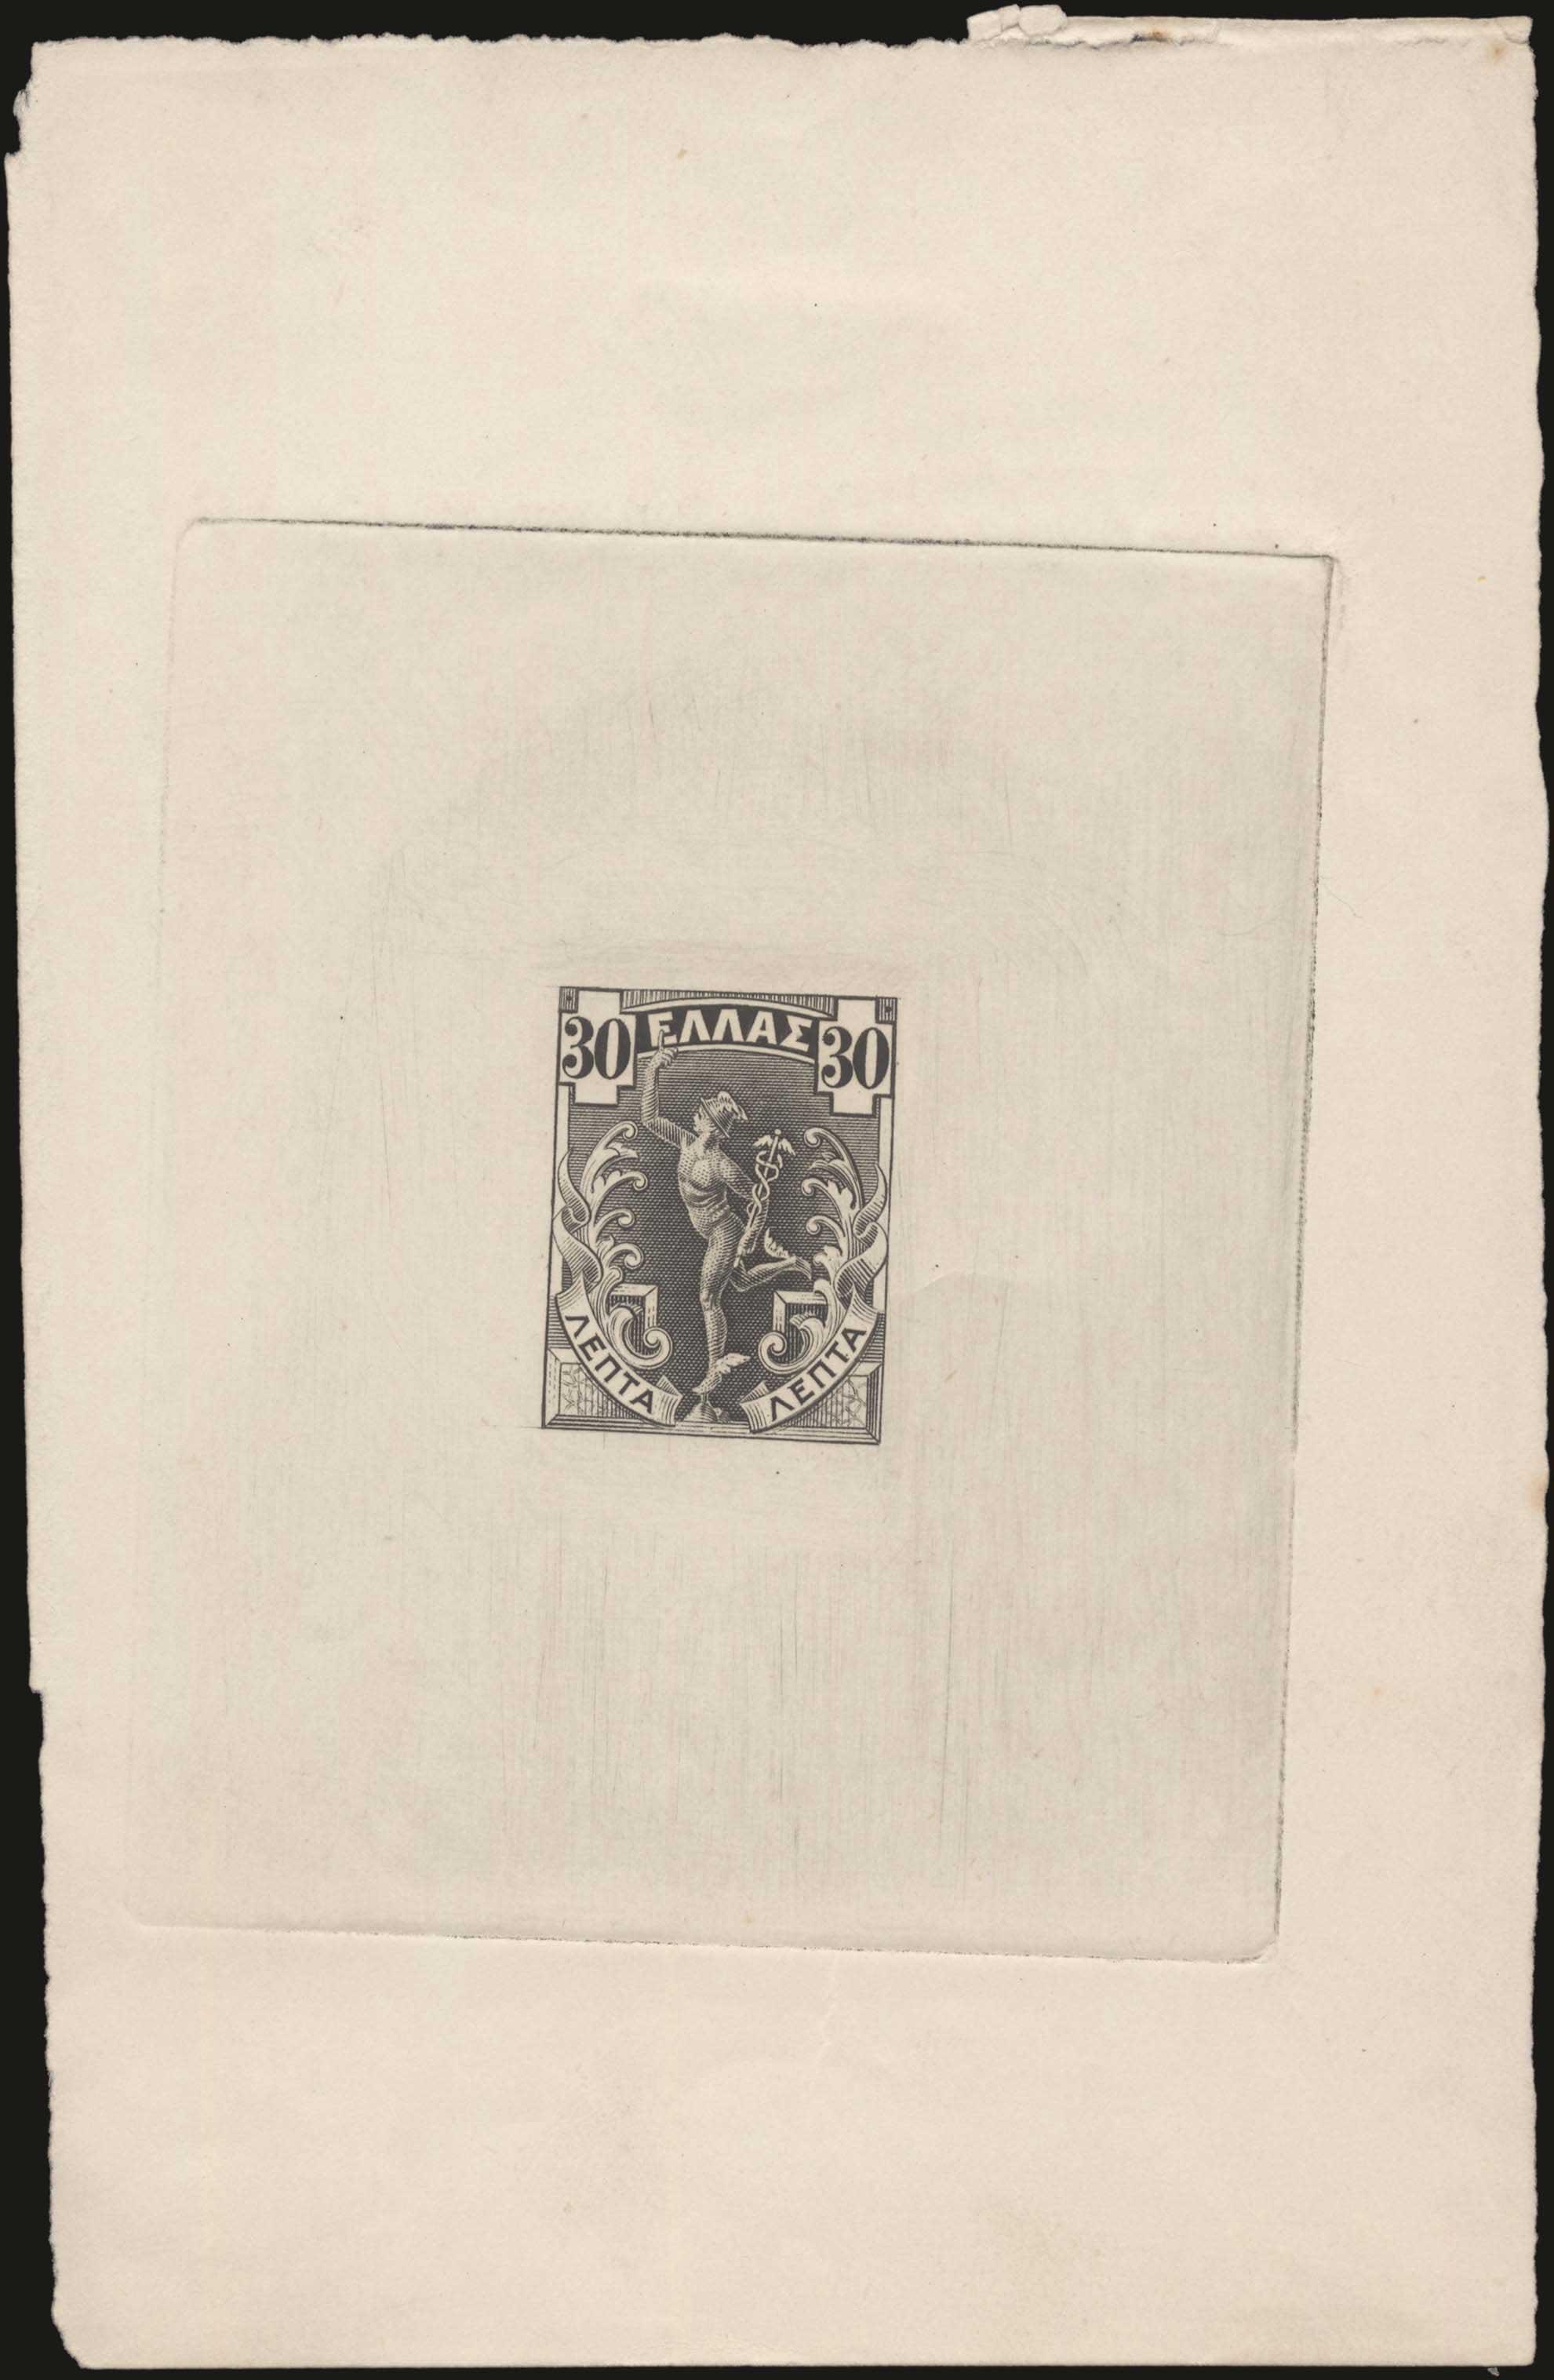 Lot 421 - -  1901/02 FLYING MERCURY & A.M. 1901/02 FLYING MERCURY & A.M. -  A. Karamitsos Public Auction 639 General Stamp Sale